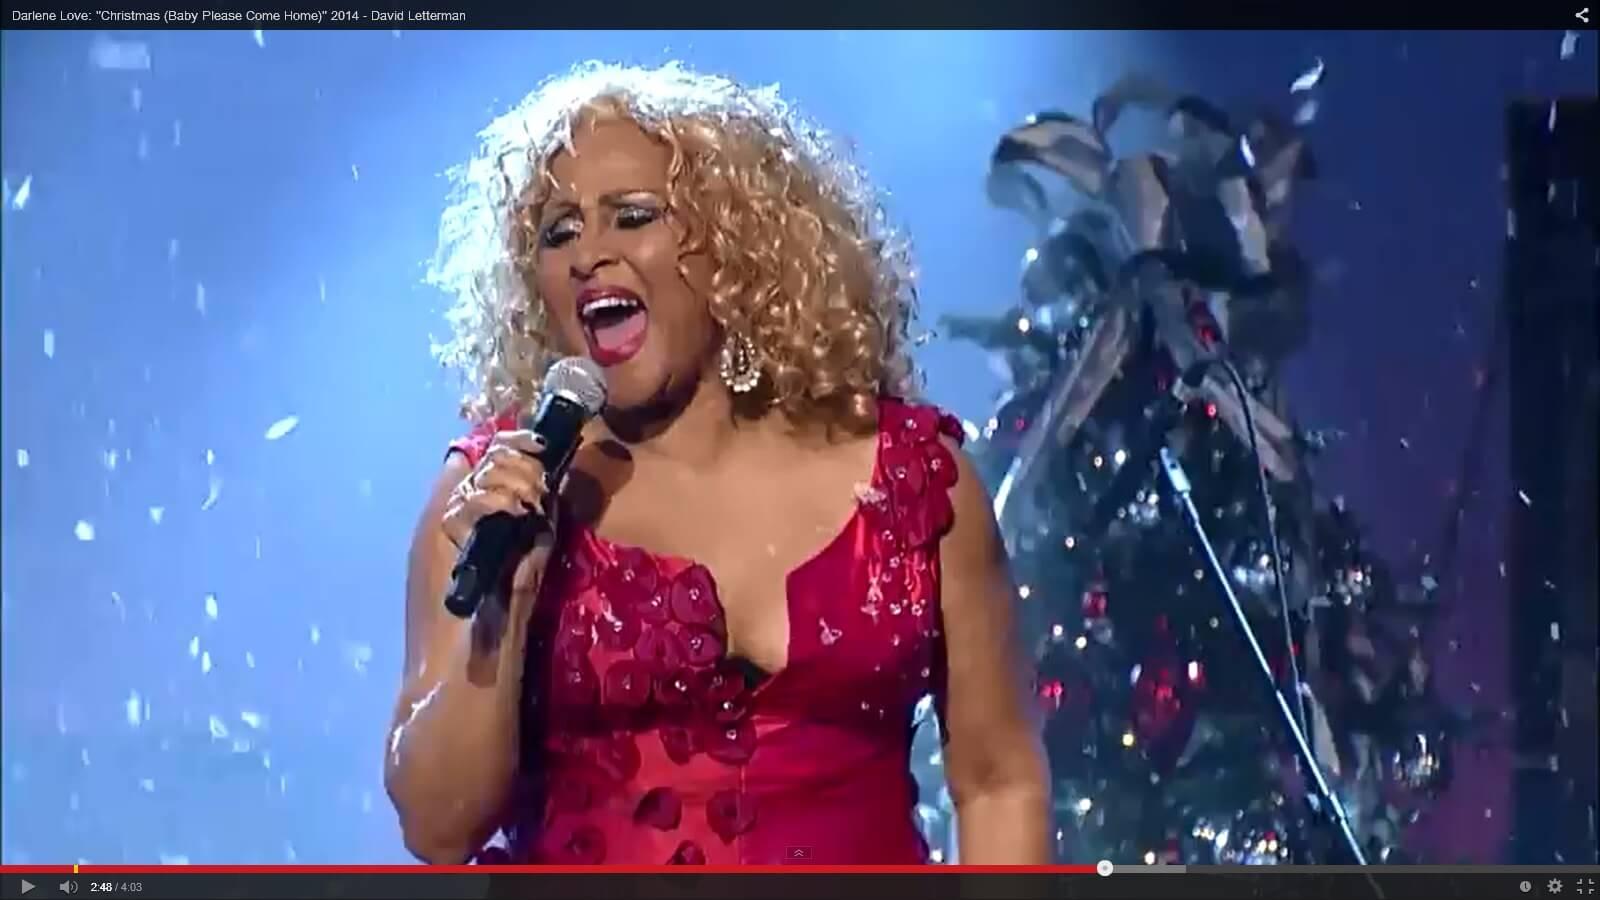 darlene love baby please come home - Darlene Love Christmas Baby Please Come Home